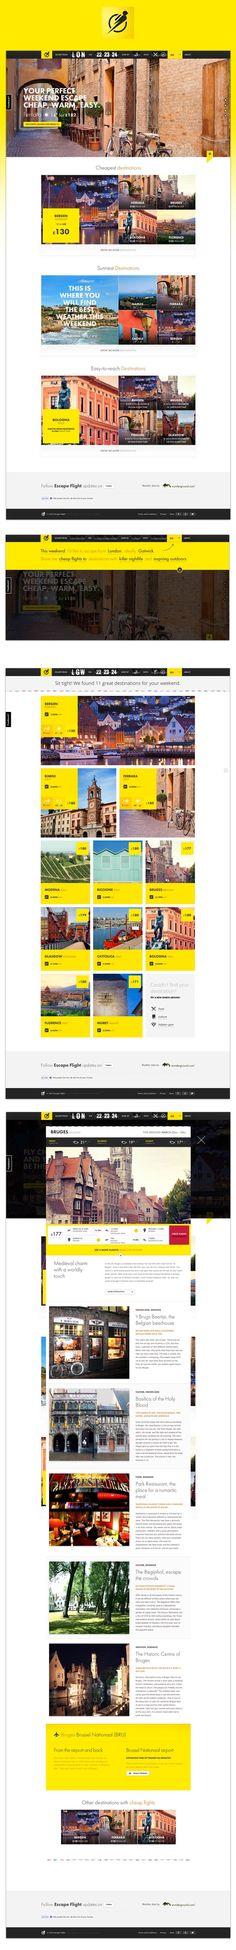 Escape Flight #website #webdesign #inspiration #yellow #travel